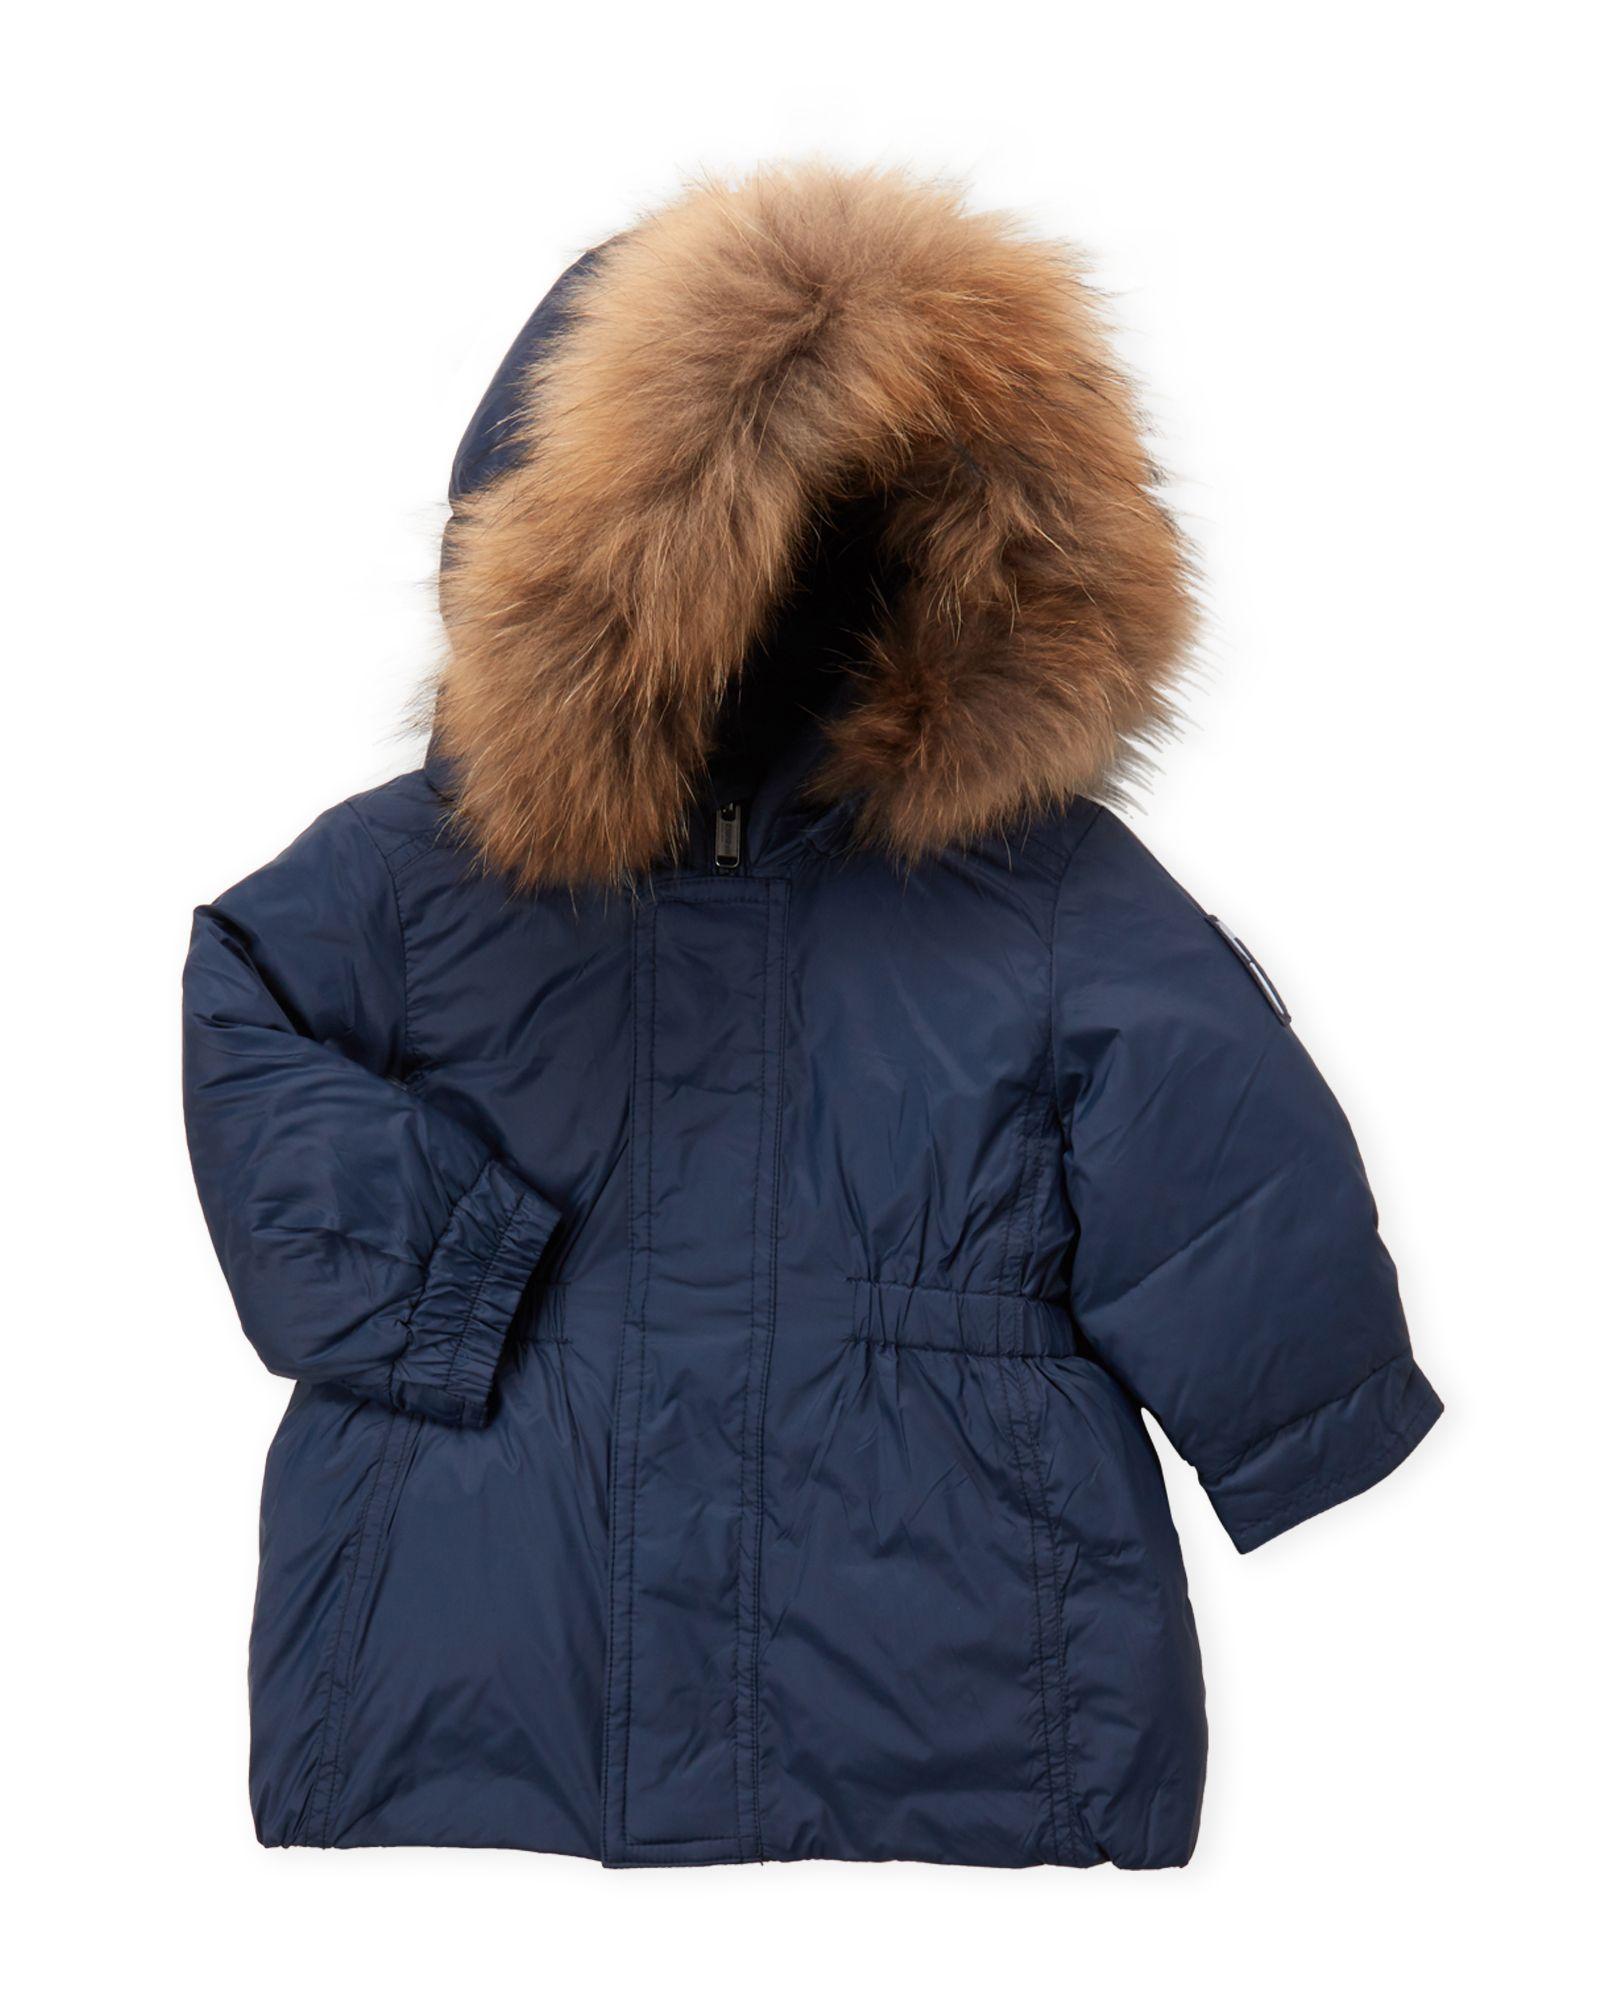 1843c1b8b Bomboogie (Infant Boys) Navy Real Fur Trim Hooded Down Coat ...